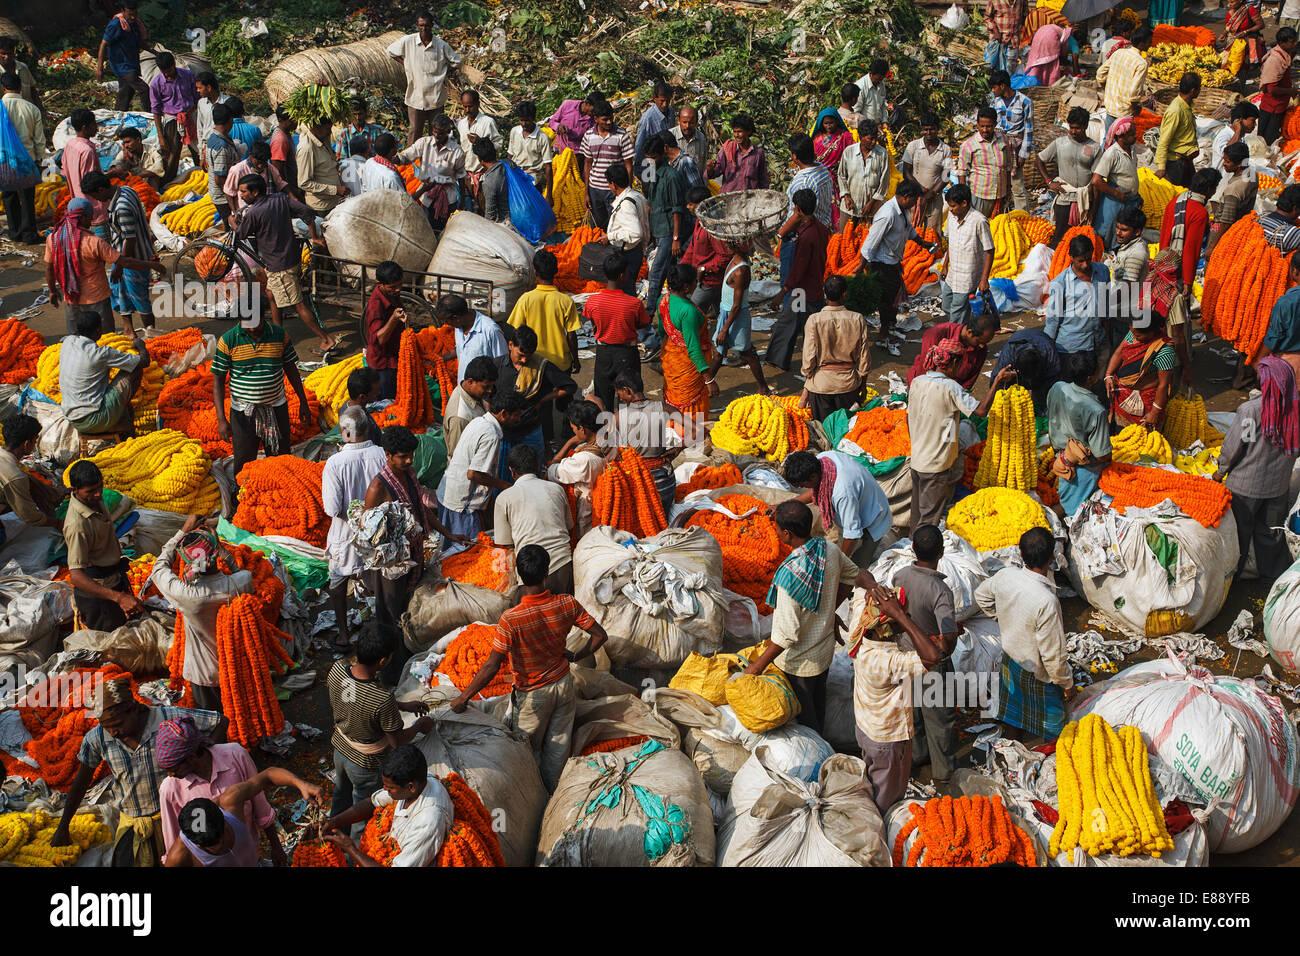 The famous flower market in Kolkata, India. - Stock Image